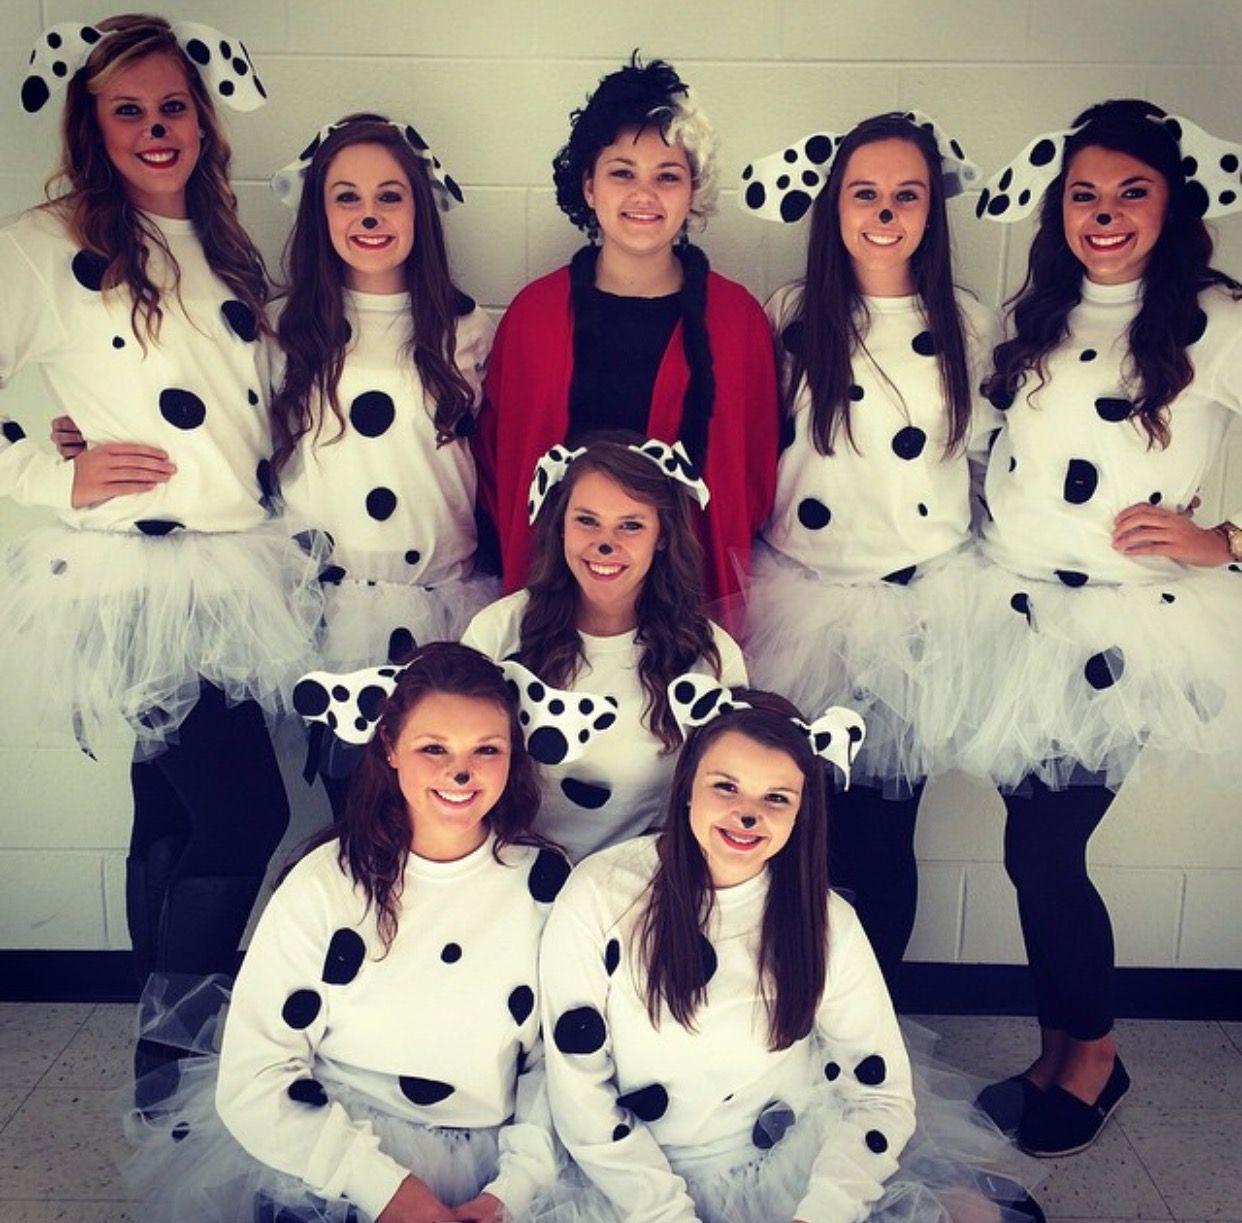 DIY 101 Dalmatians for spirit week or Halloween costume